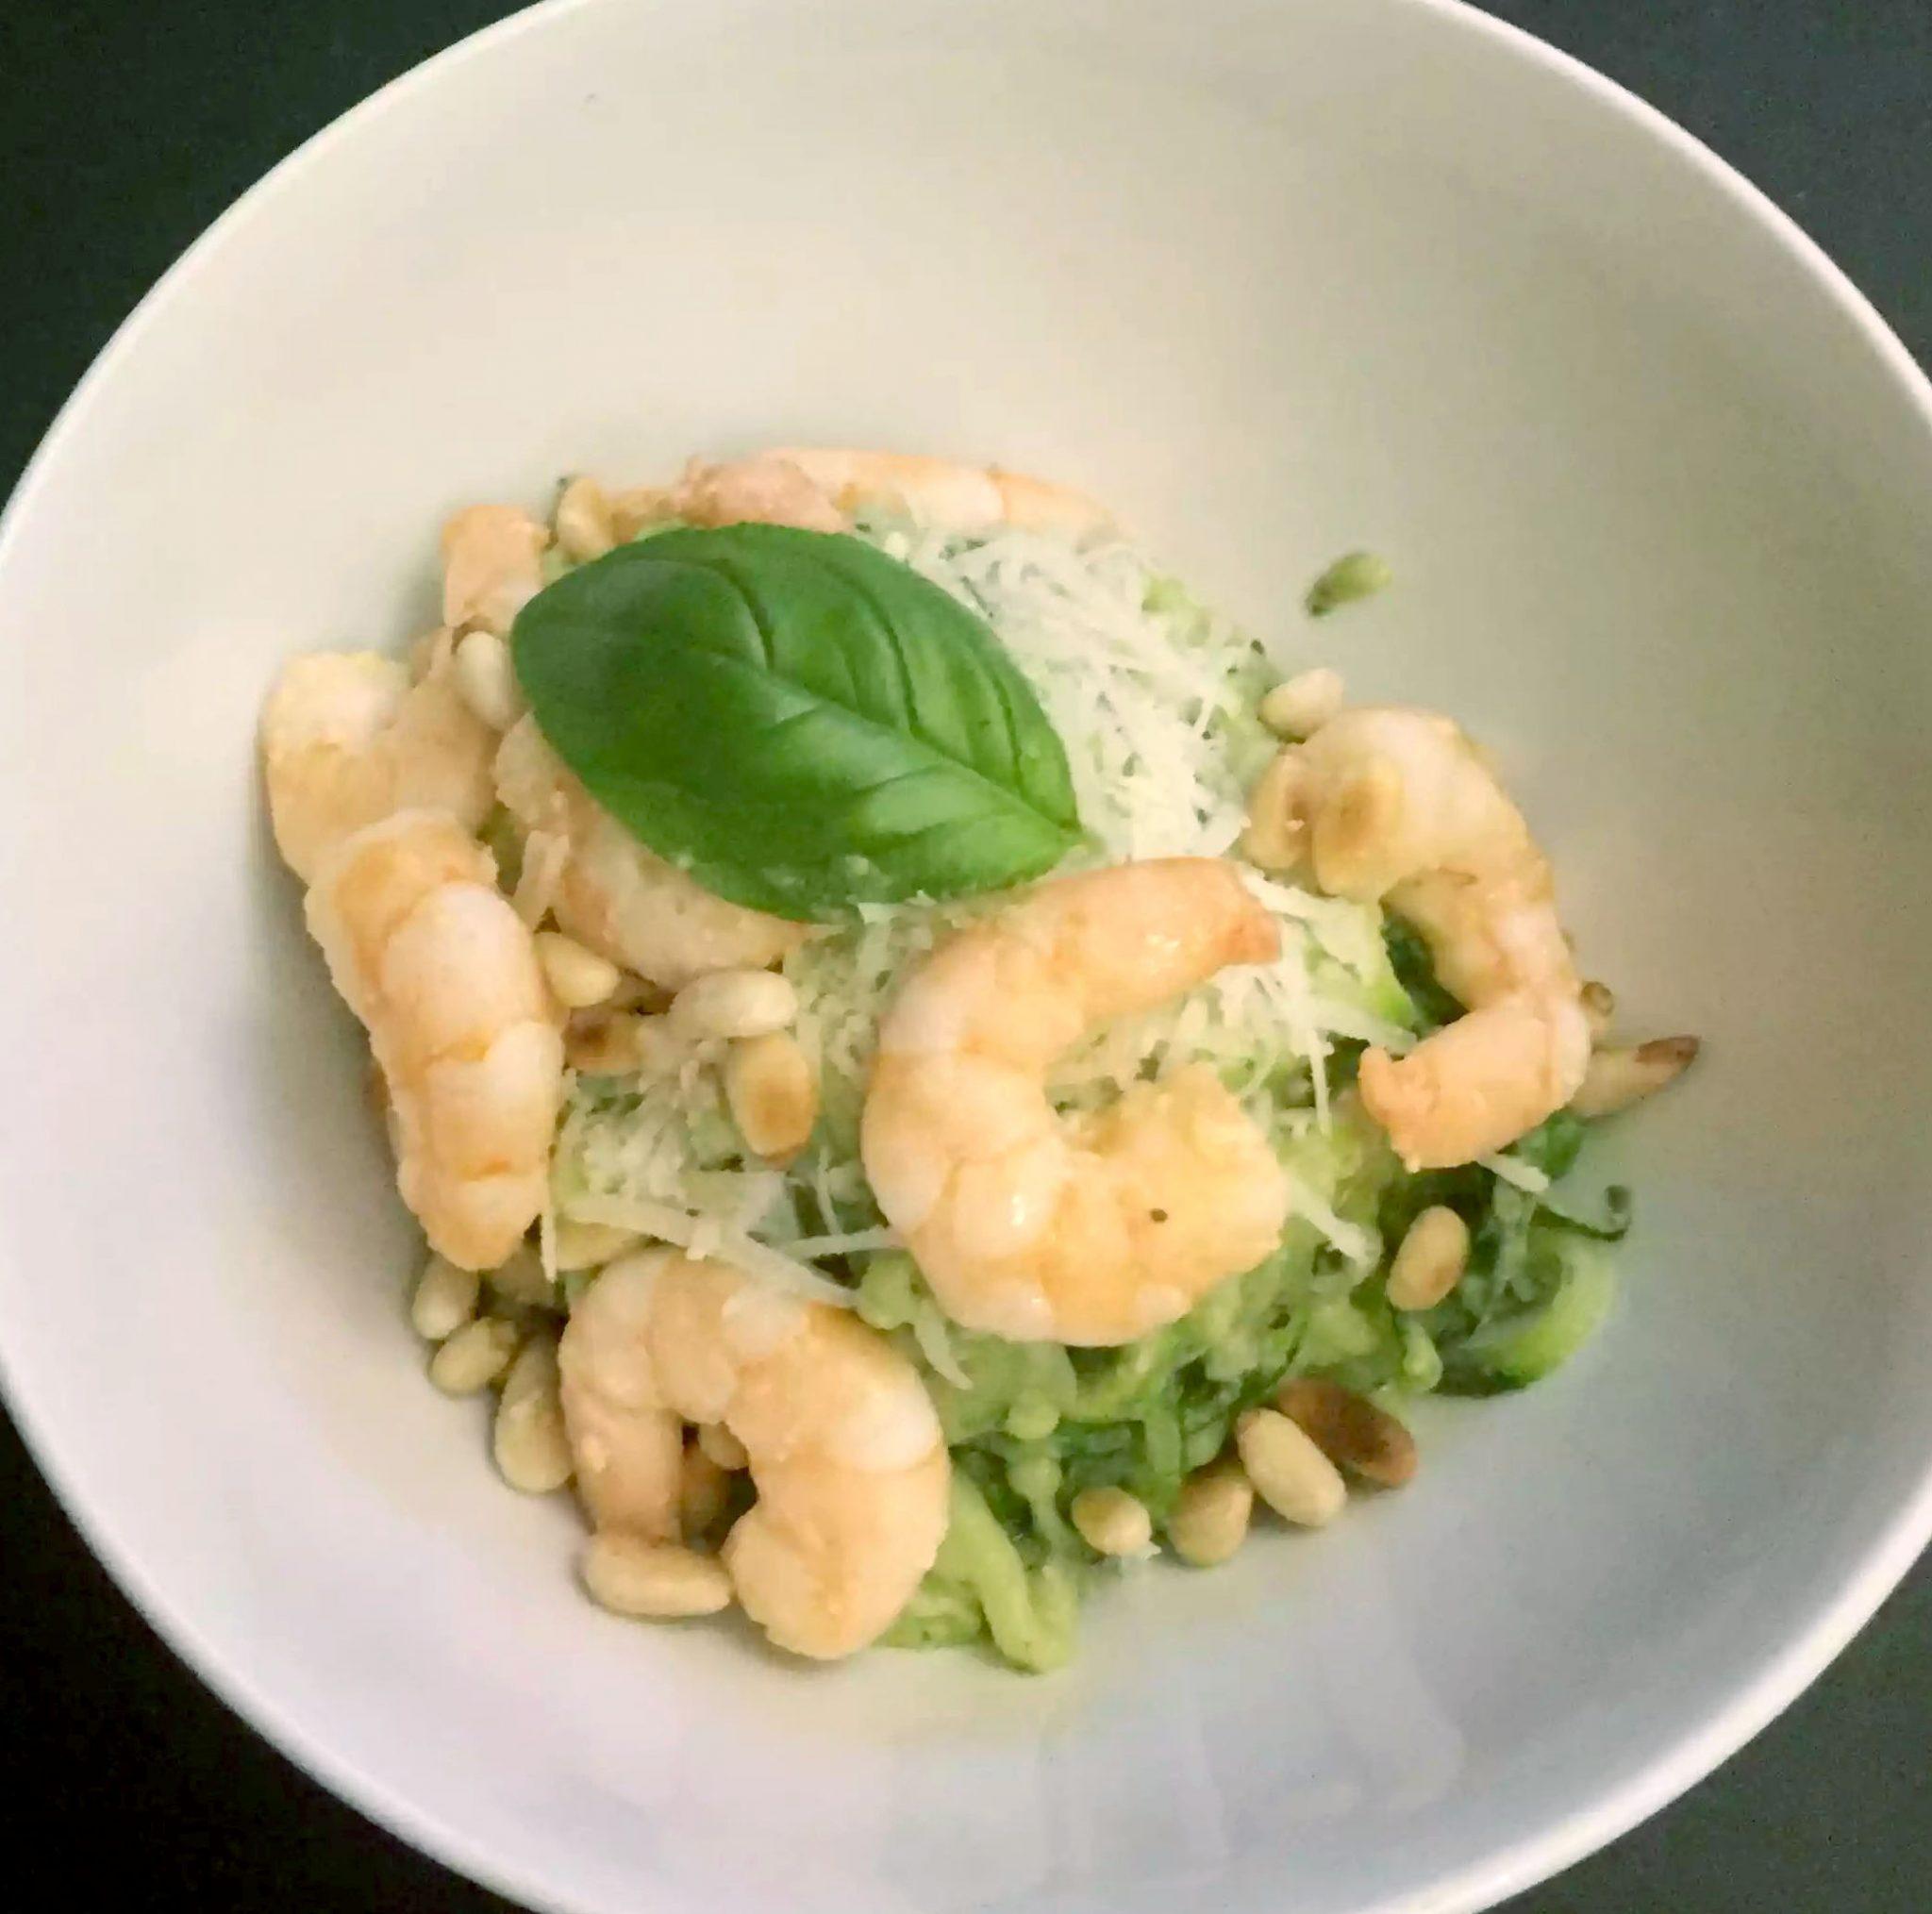 Courgetti Spaghetti Avocado Pesto Prawns Basil Parmesan Pine Nuts Clean Eating Healthy Fats Grain-Free Gluten-Free Paleo SCD